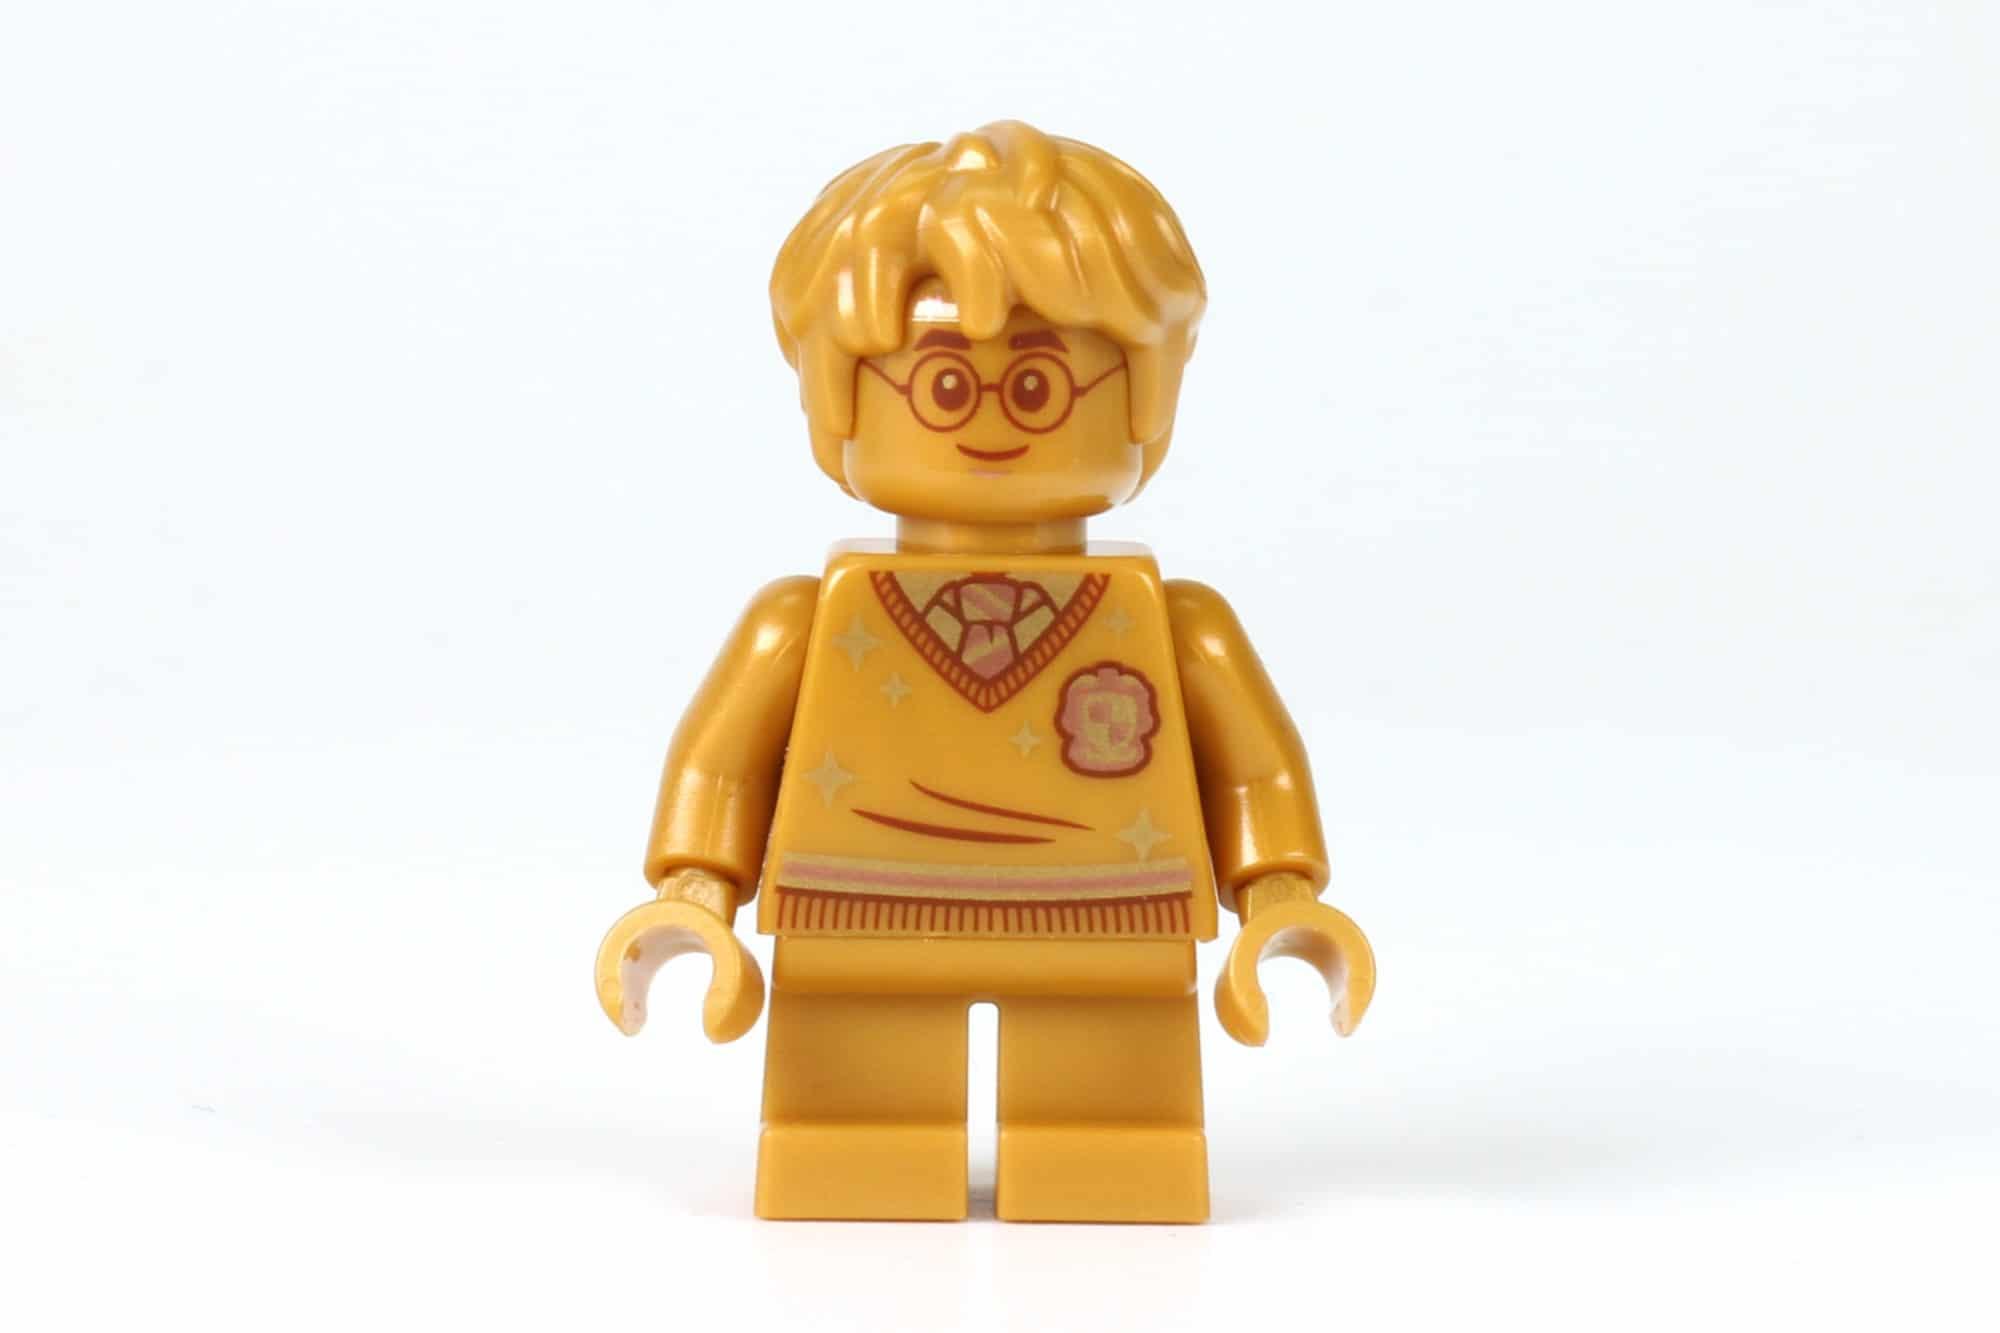 LEGO Harry Potter 76386 Hogwarts Misslungener Vielsafttrank Minifiguren 4 1